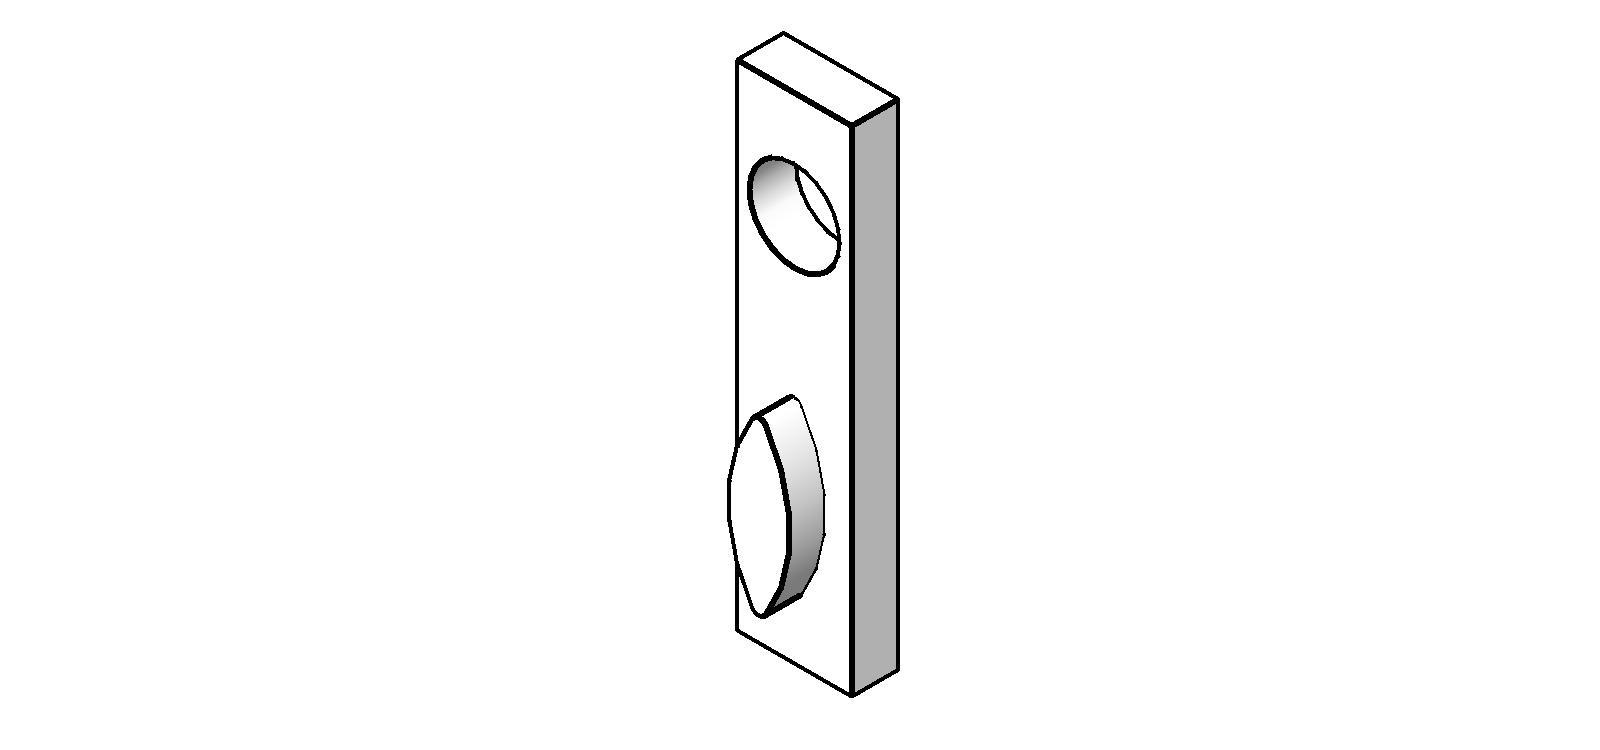 Door Hardwares Exit Device Trim 718 Thumbturn  sc 1 st  Arcat & BIM Objects / Families :: Door Hardwares: Exit Device Trim